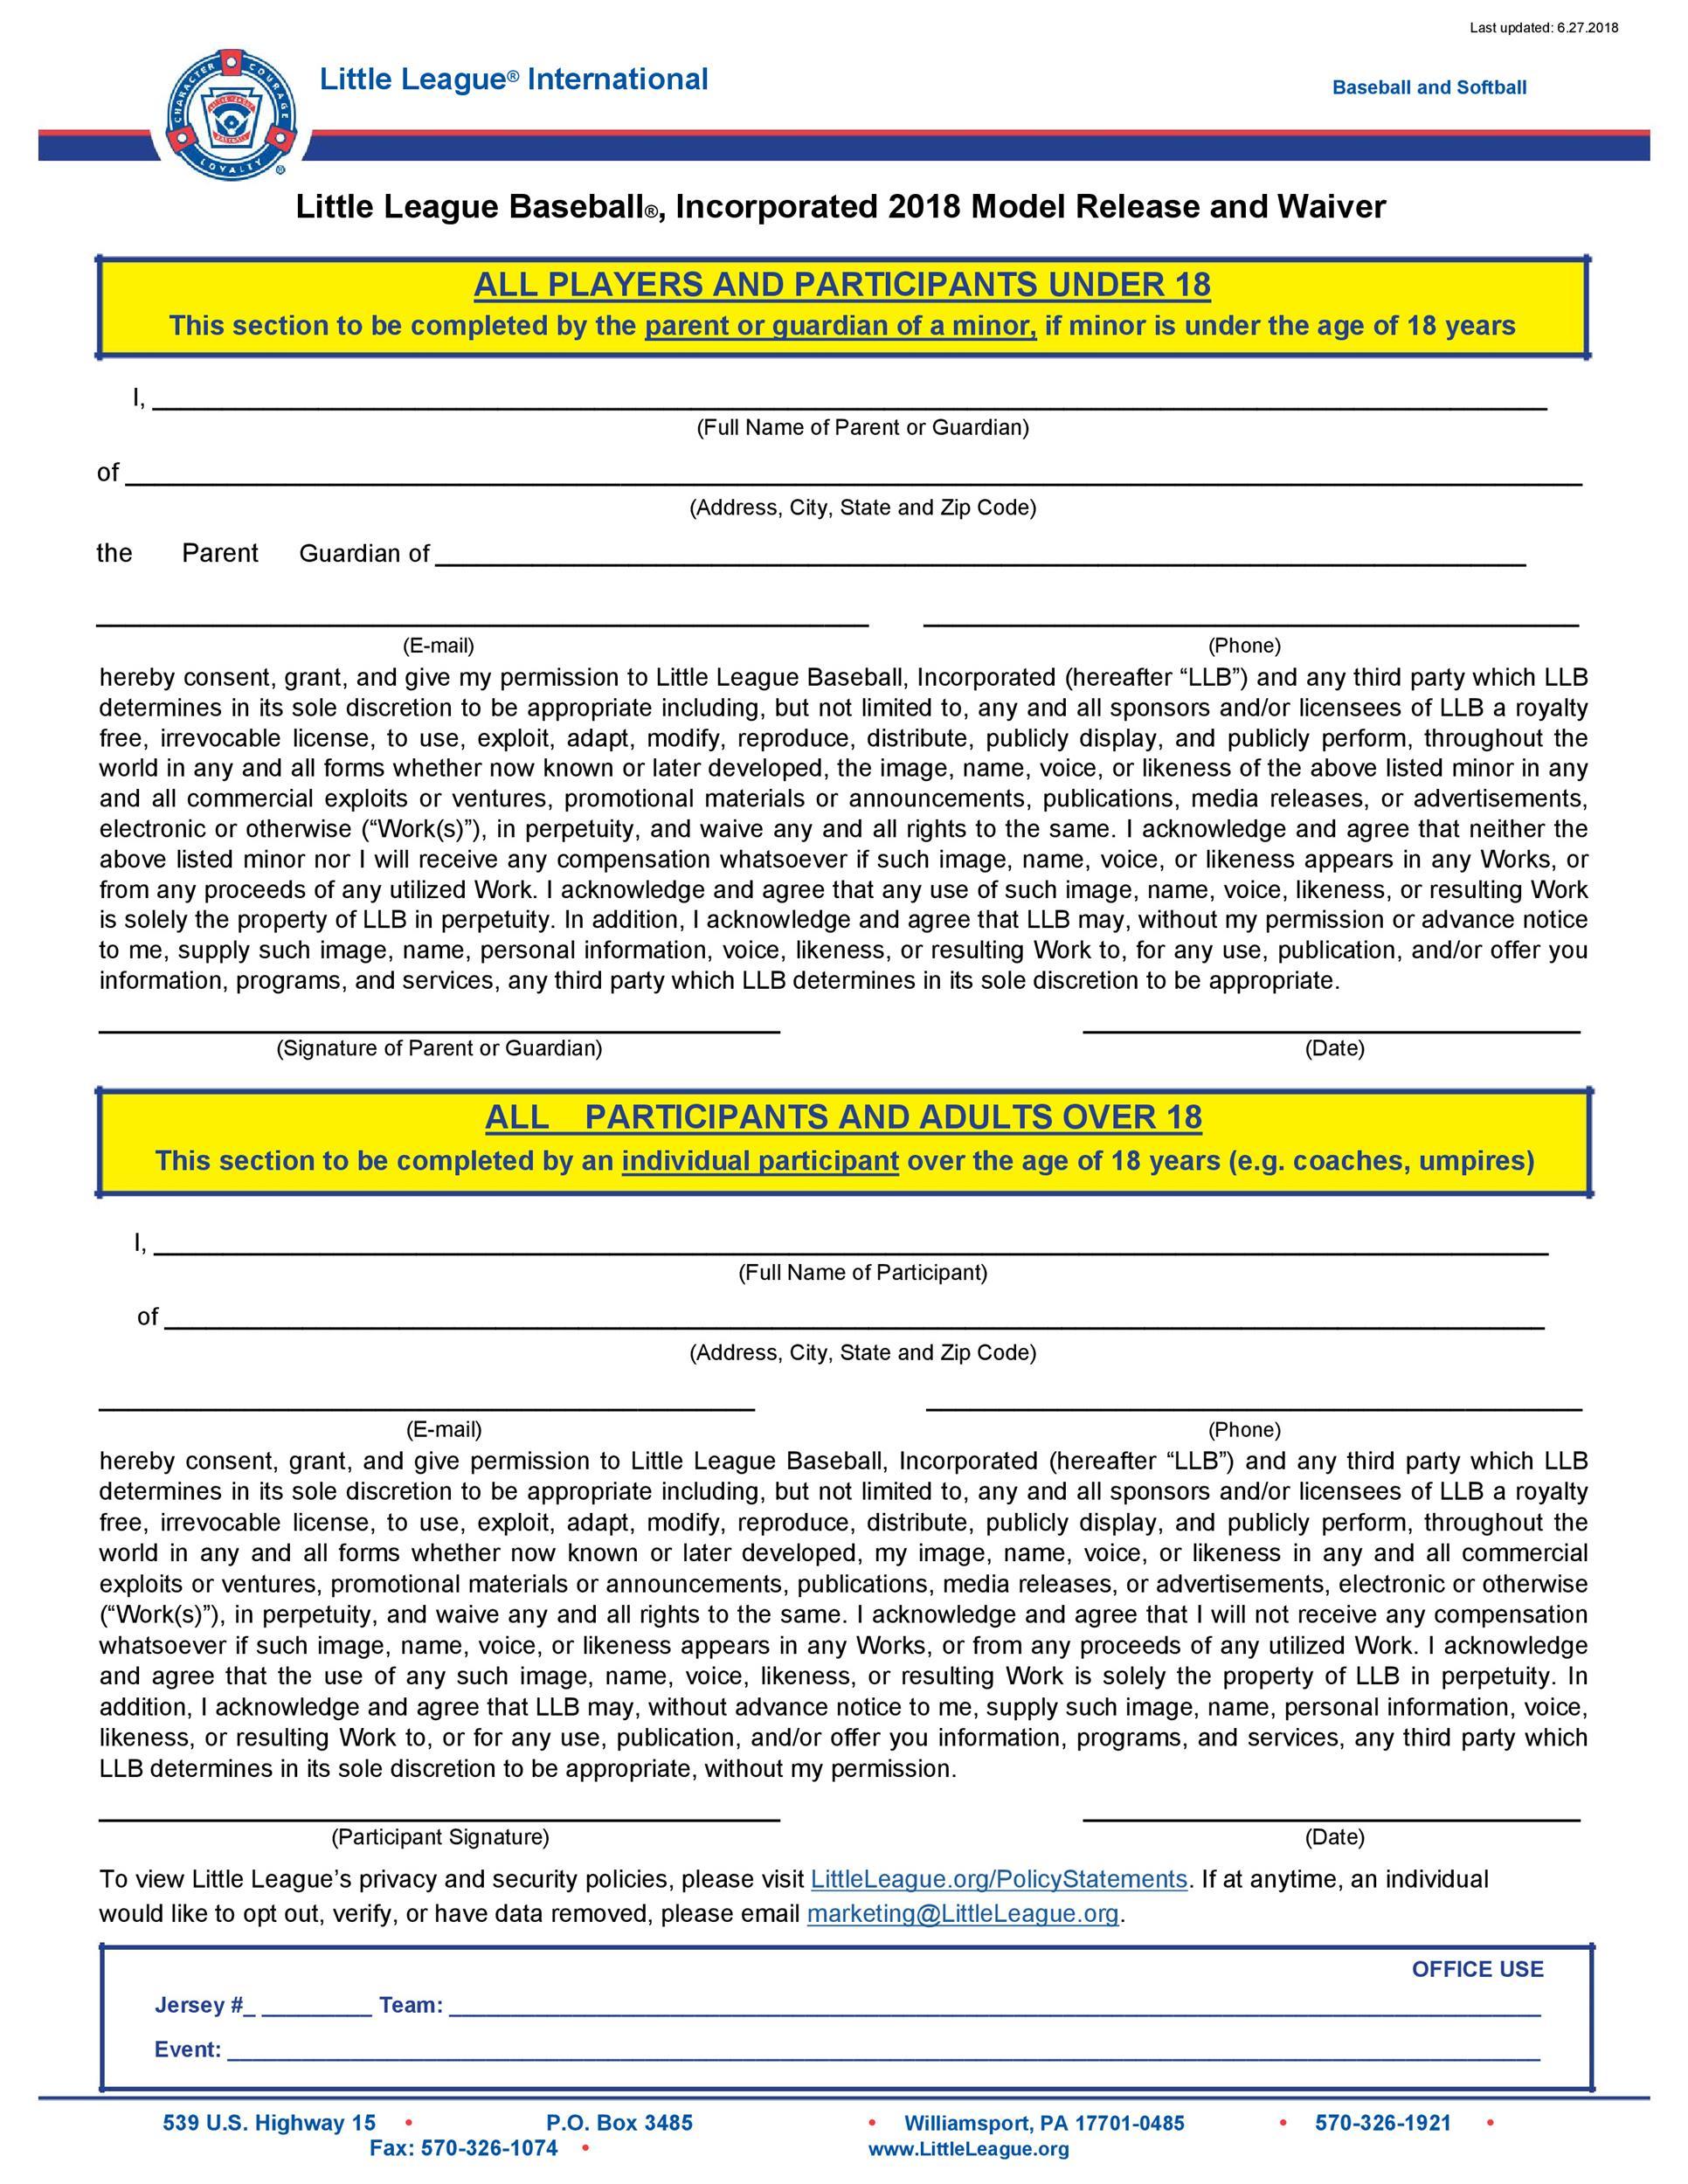 Free model release form 24